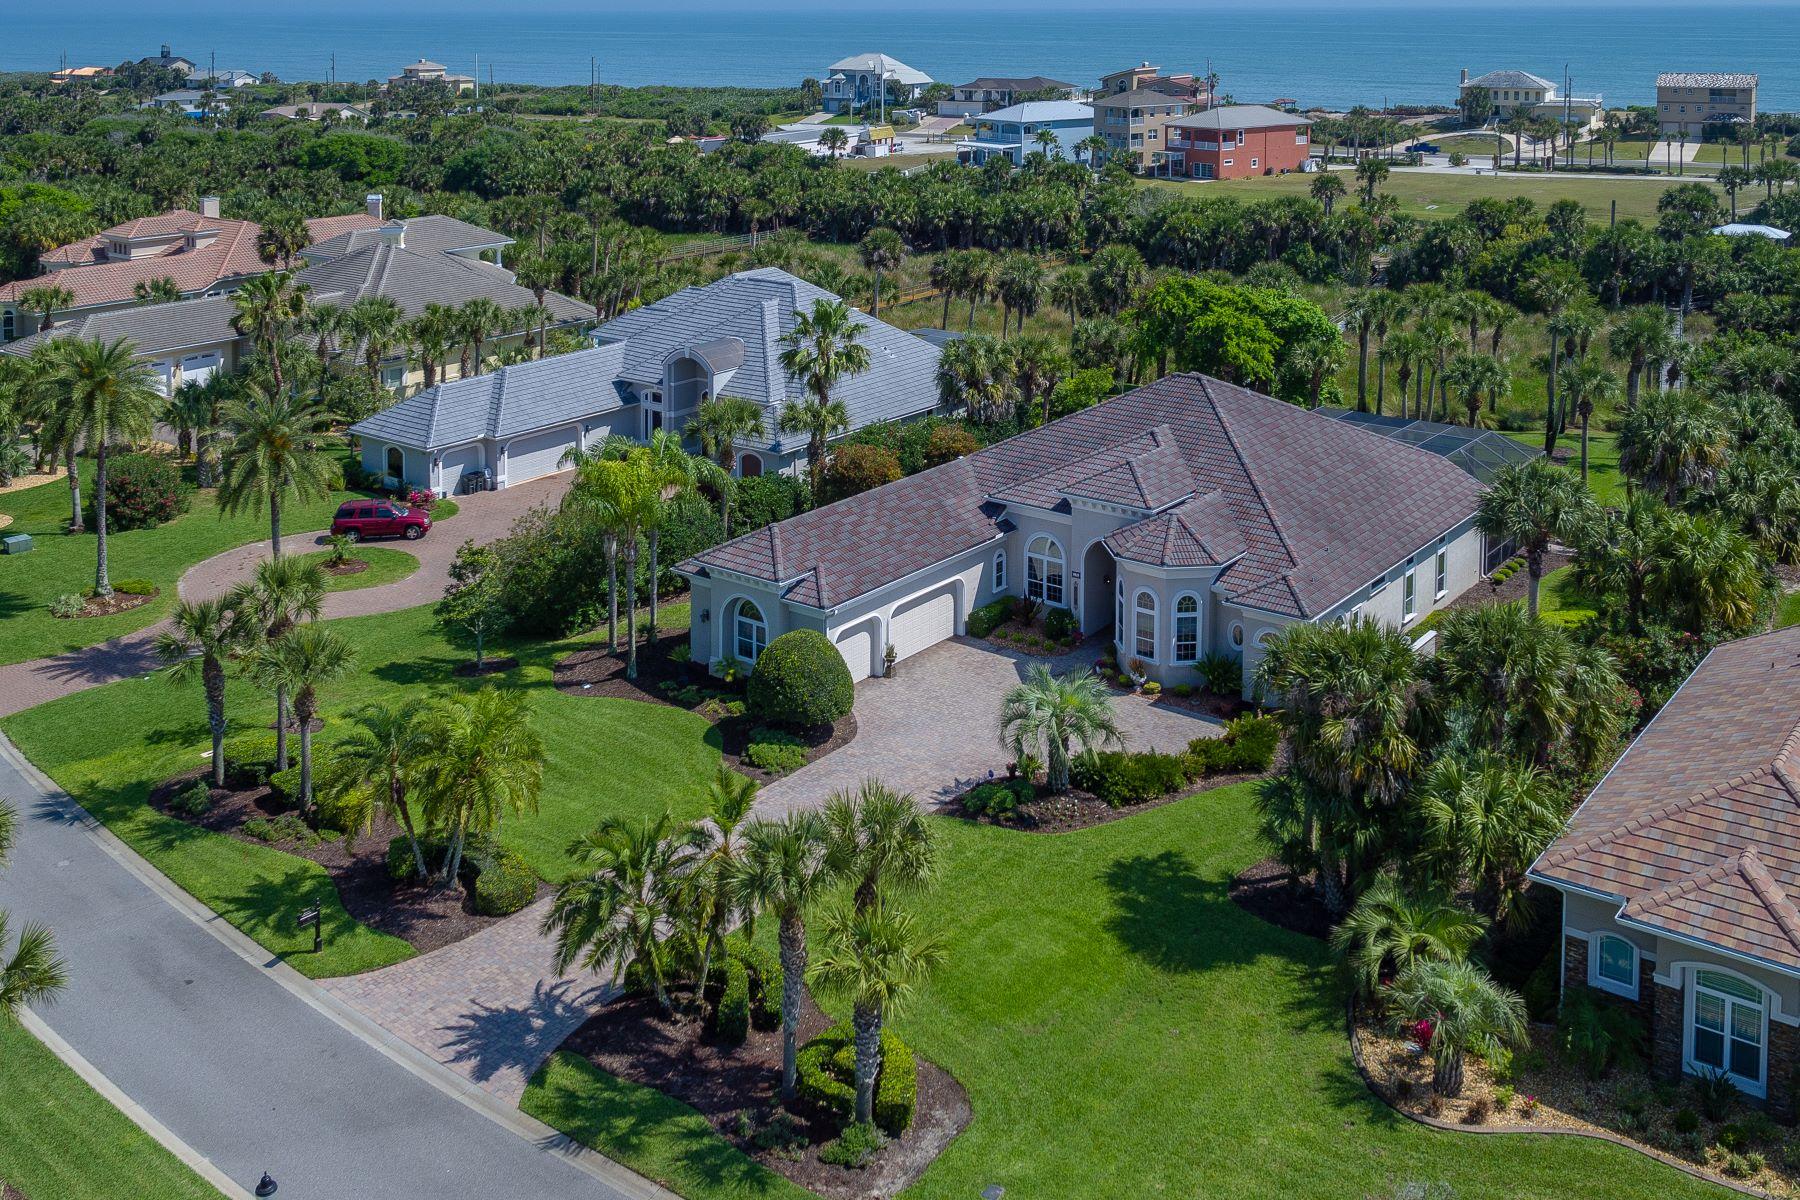 Single Family Homes for Sale at 135 Island Estates Parkway Palm Coast, Florida 32137 United States